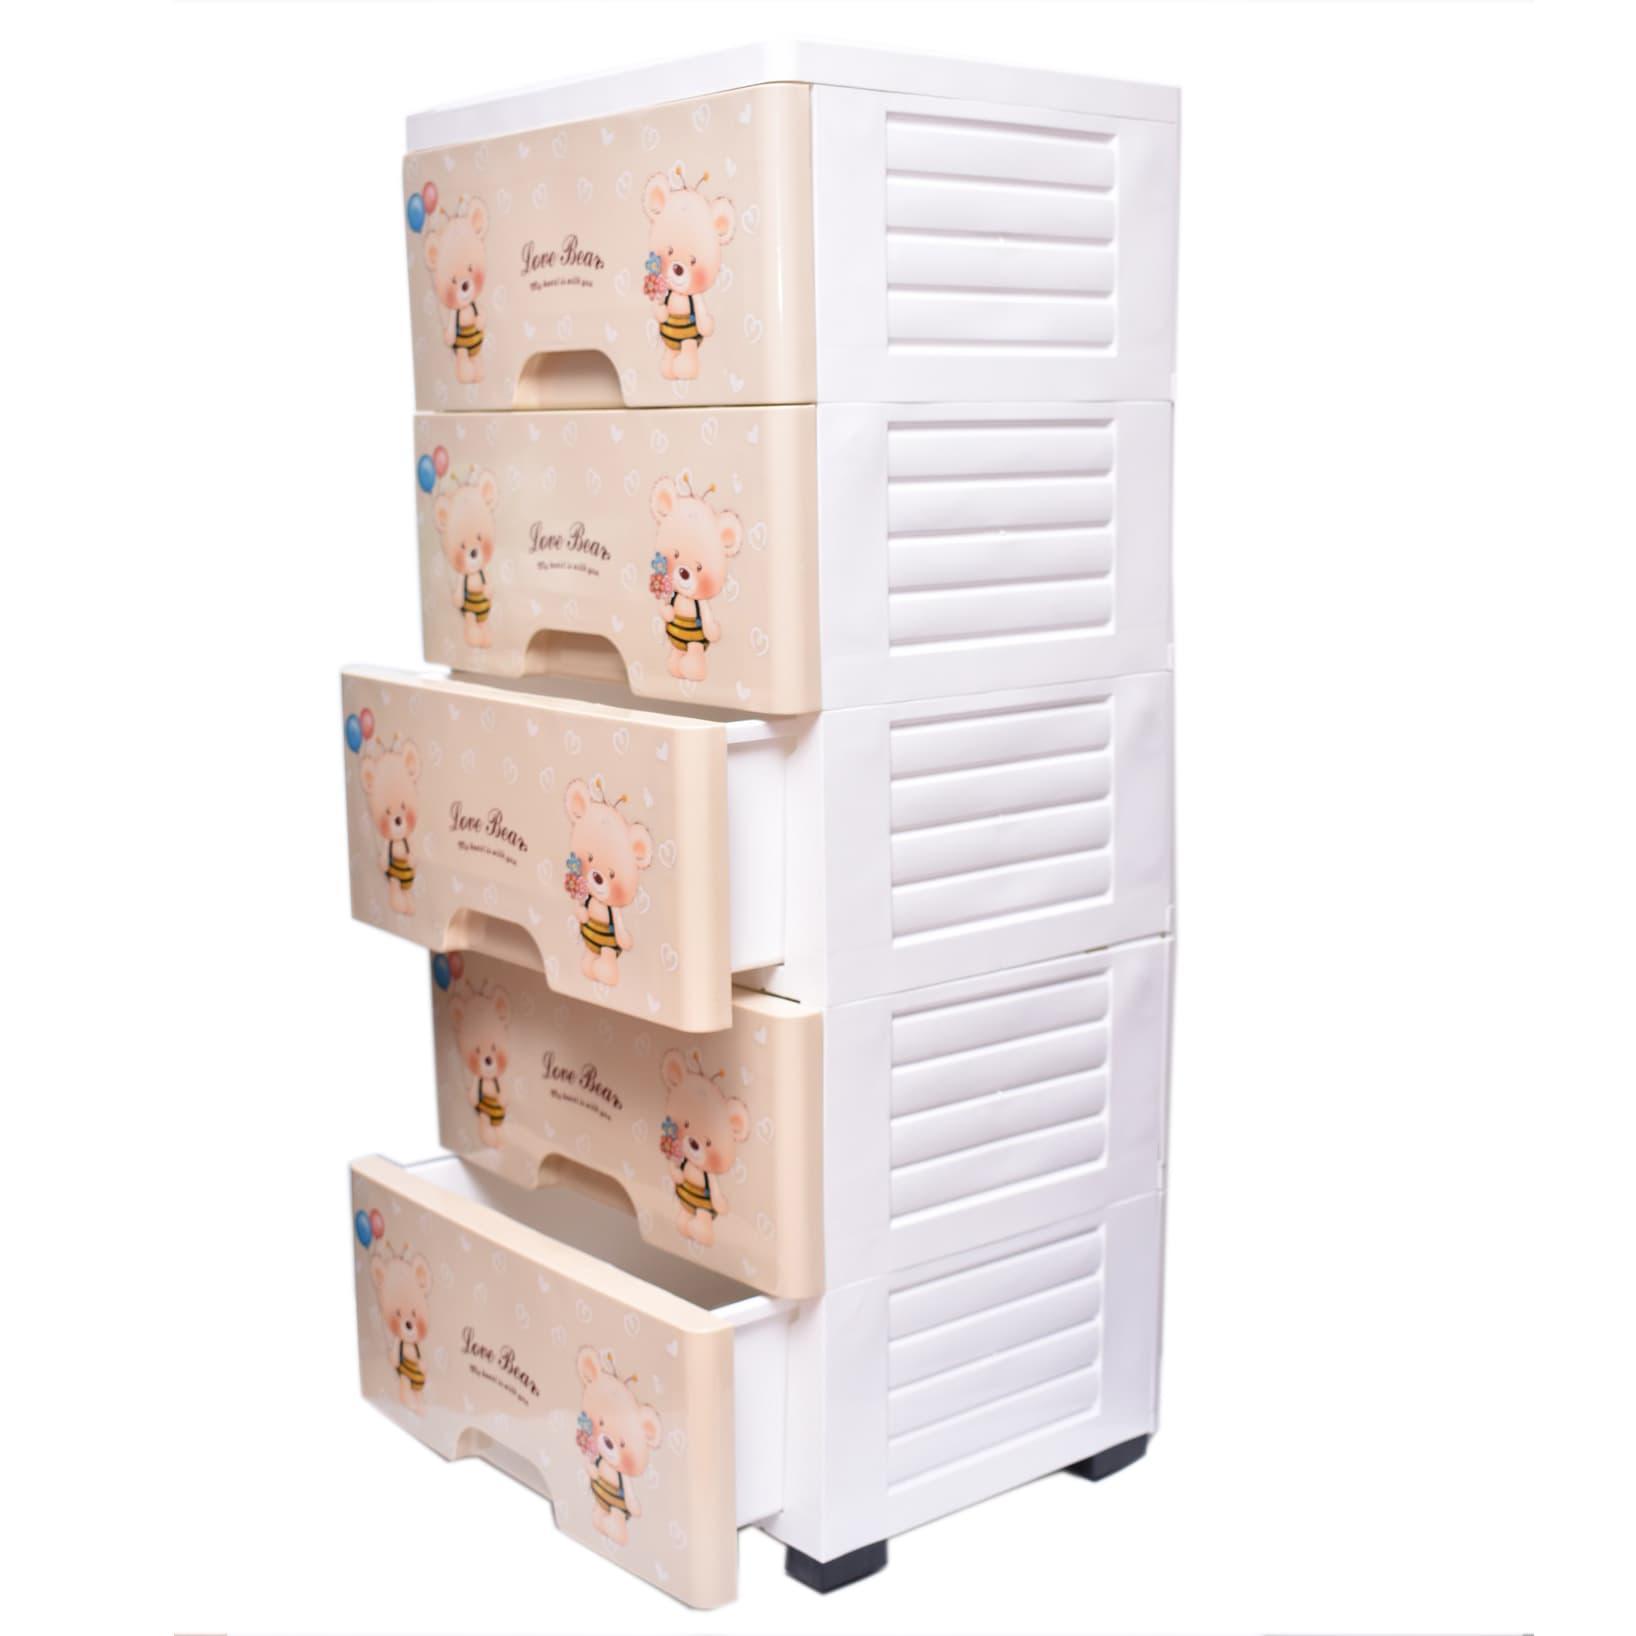 Baby Cupboard Shelf 5 Drawyers - Multi